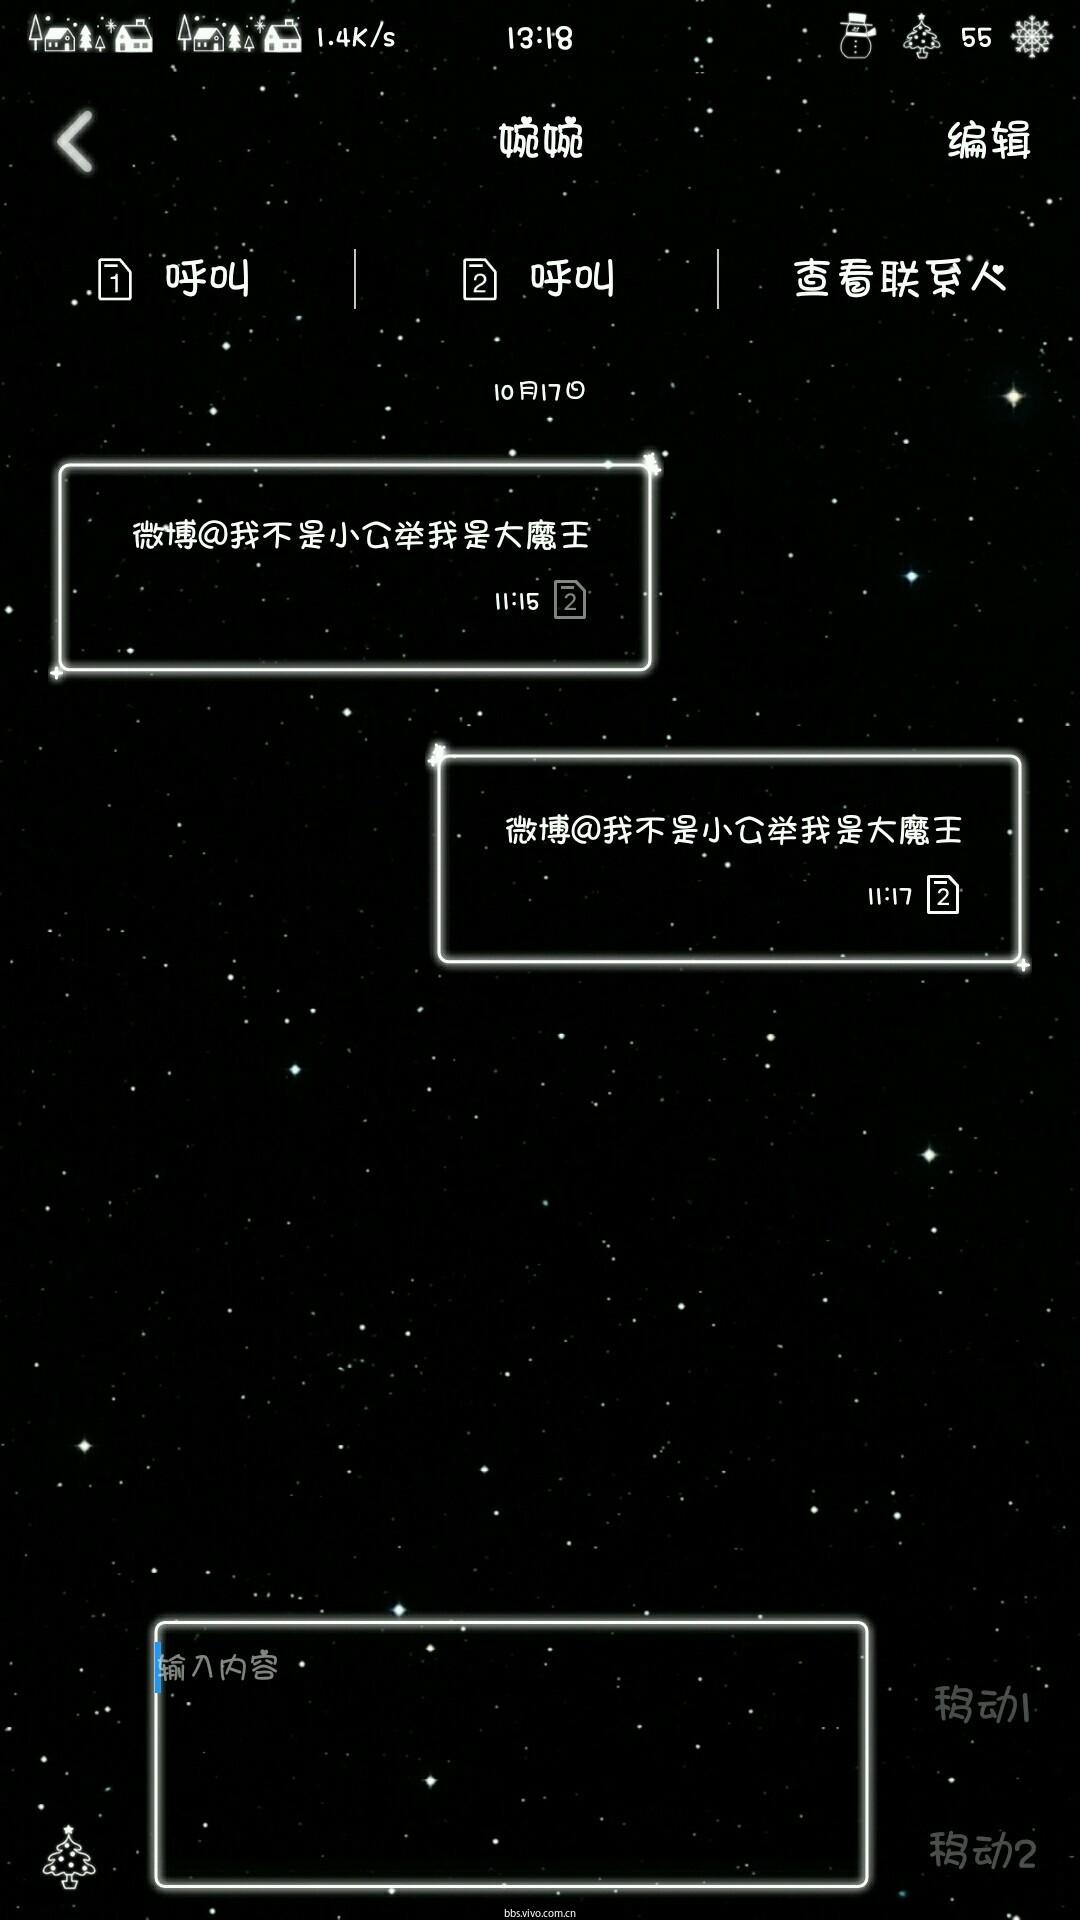 temp_--_20171223_131840.jpg